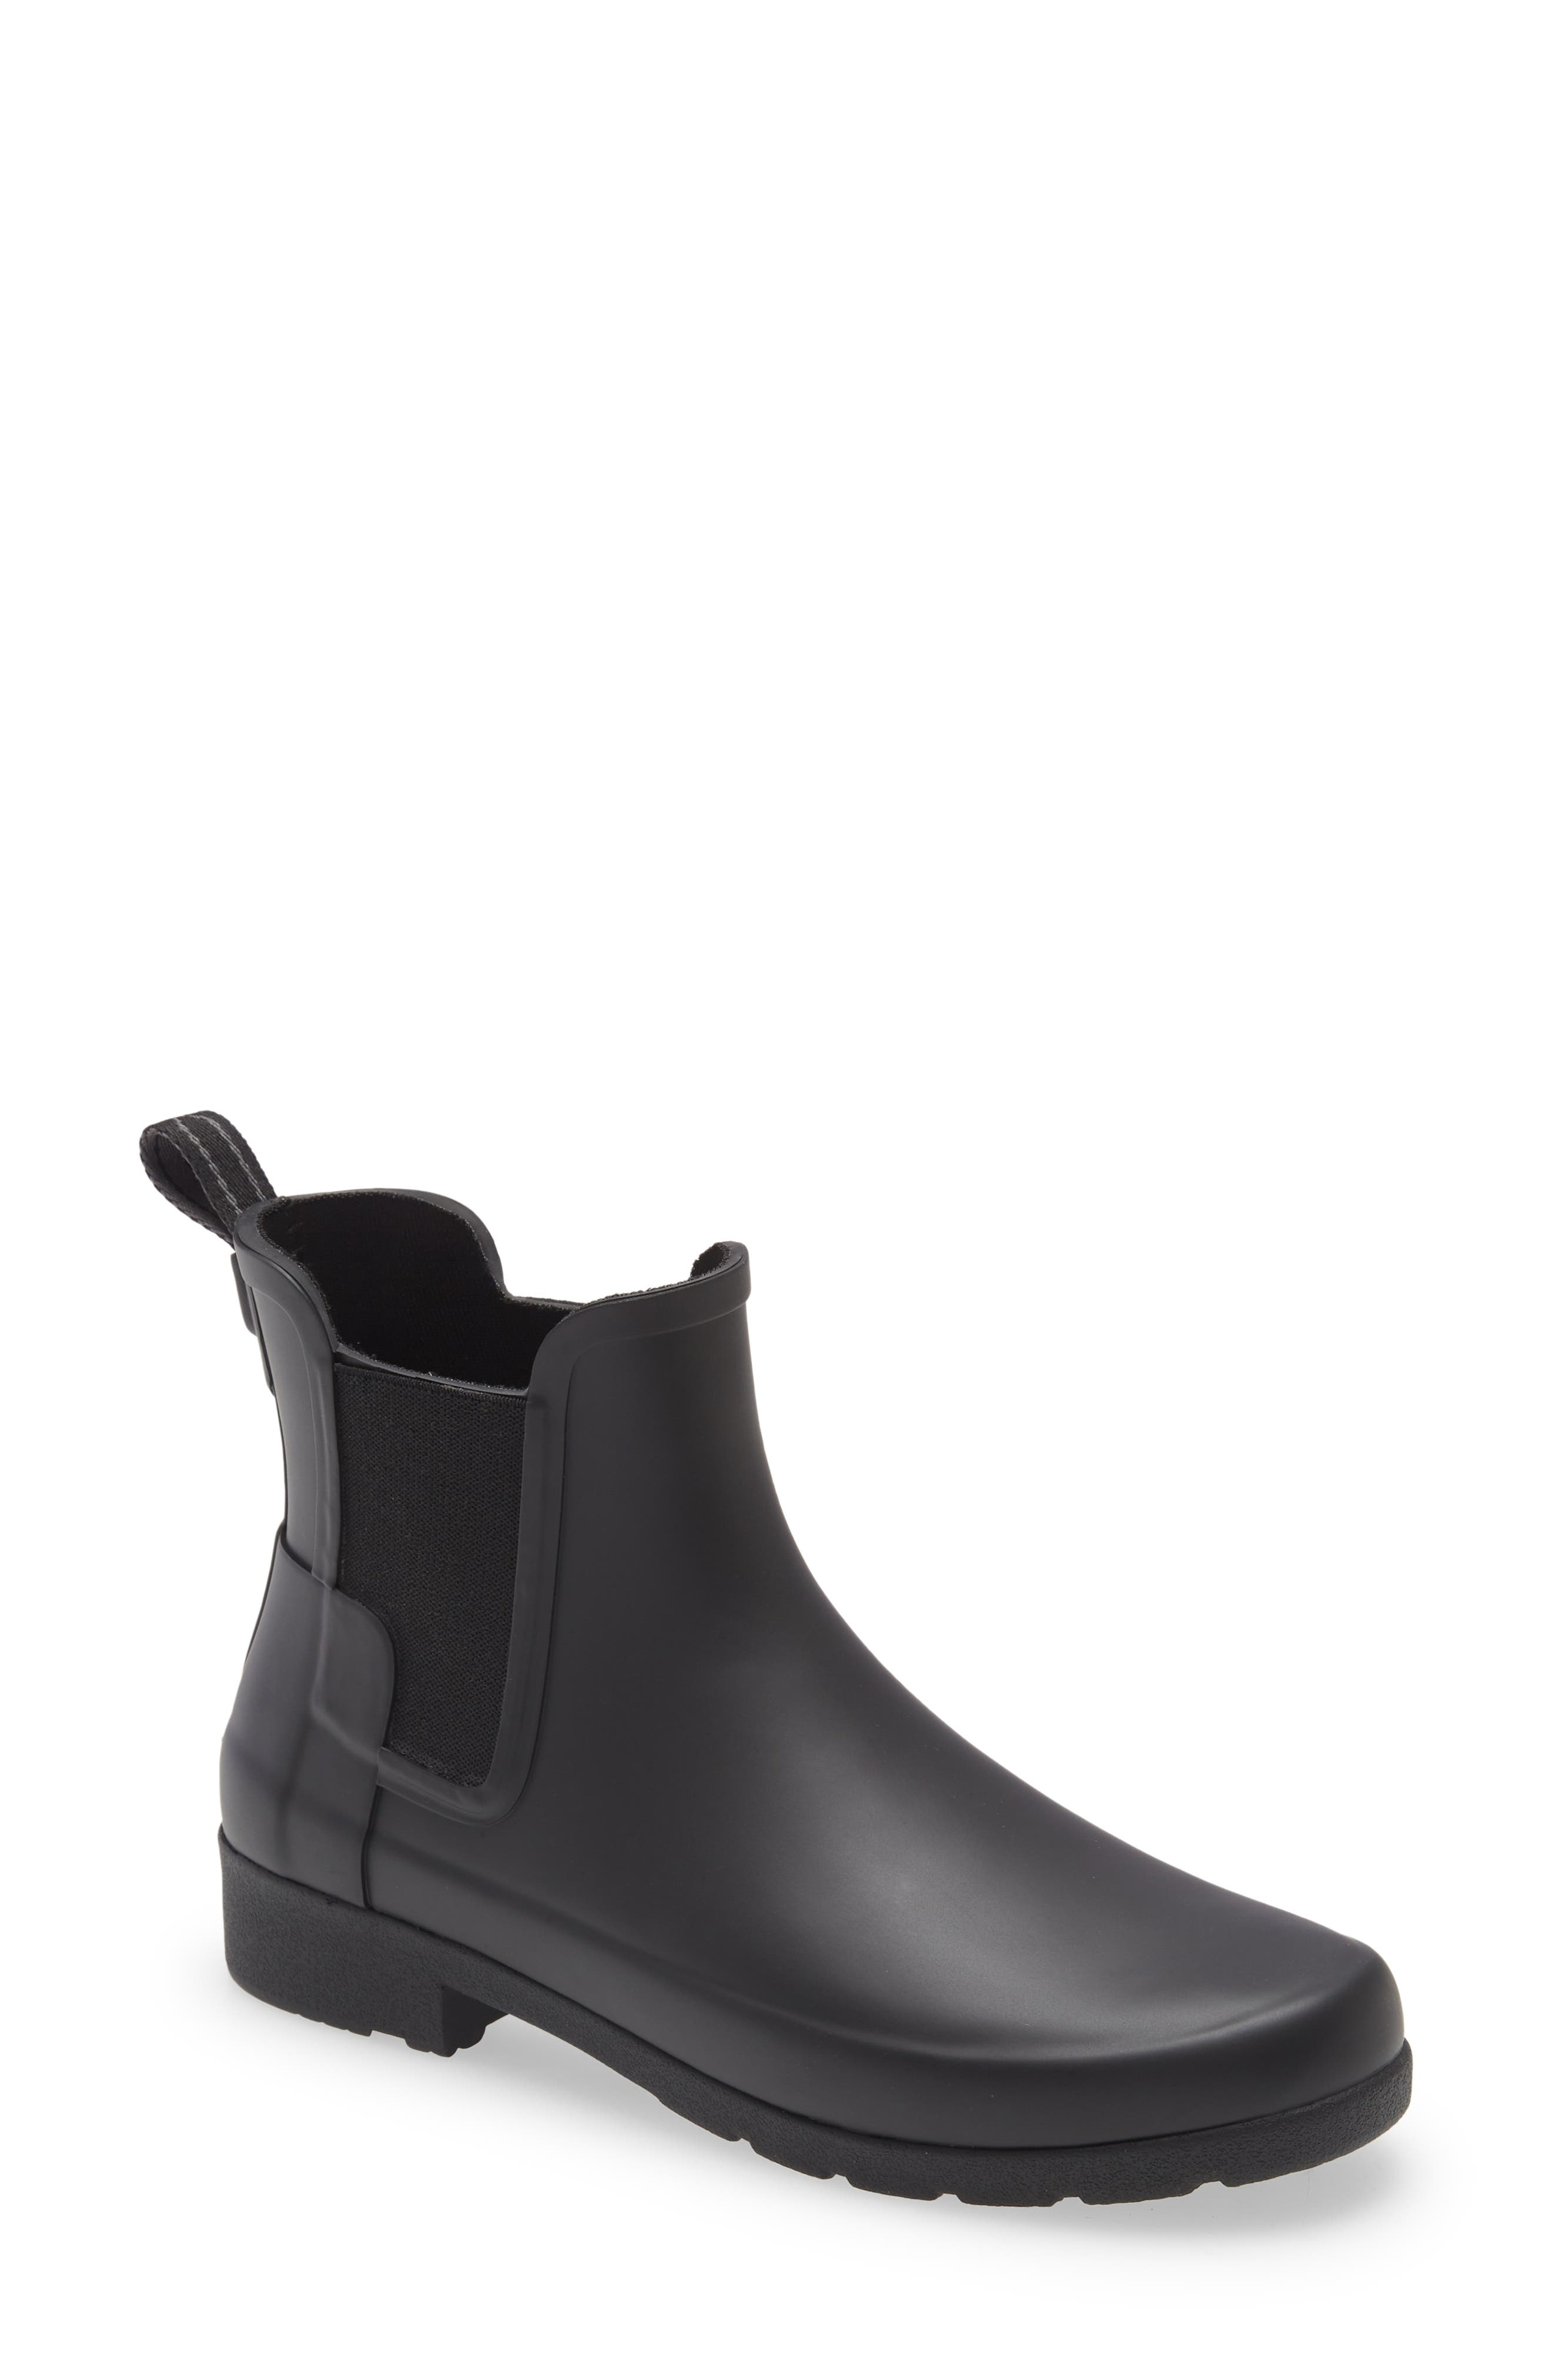 Refined Waterproof Chelsea Boot